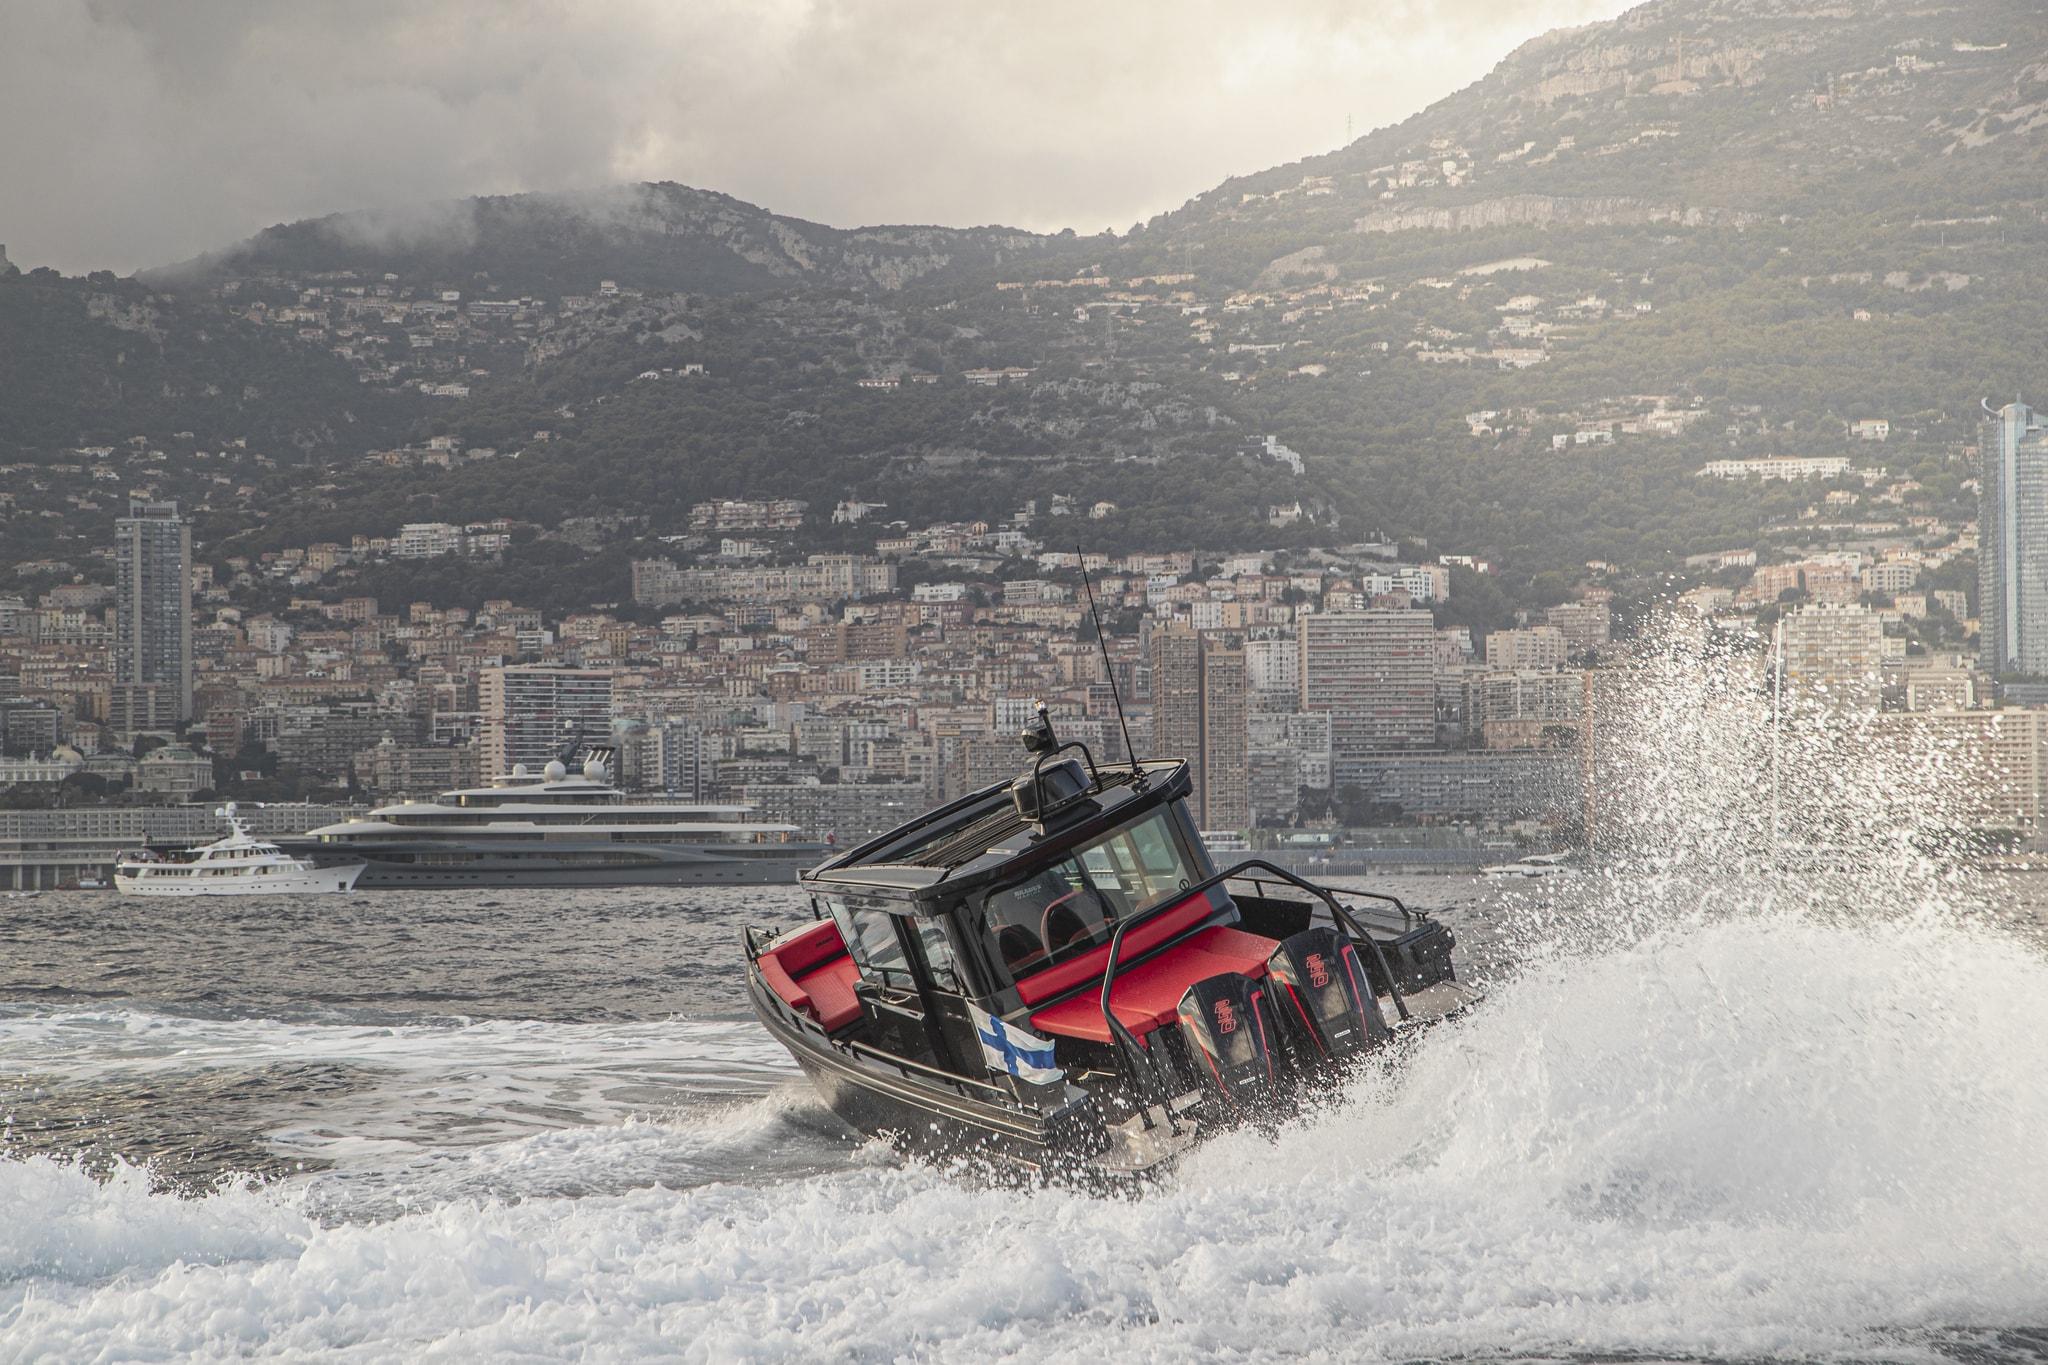 Sports boat versatile luxury